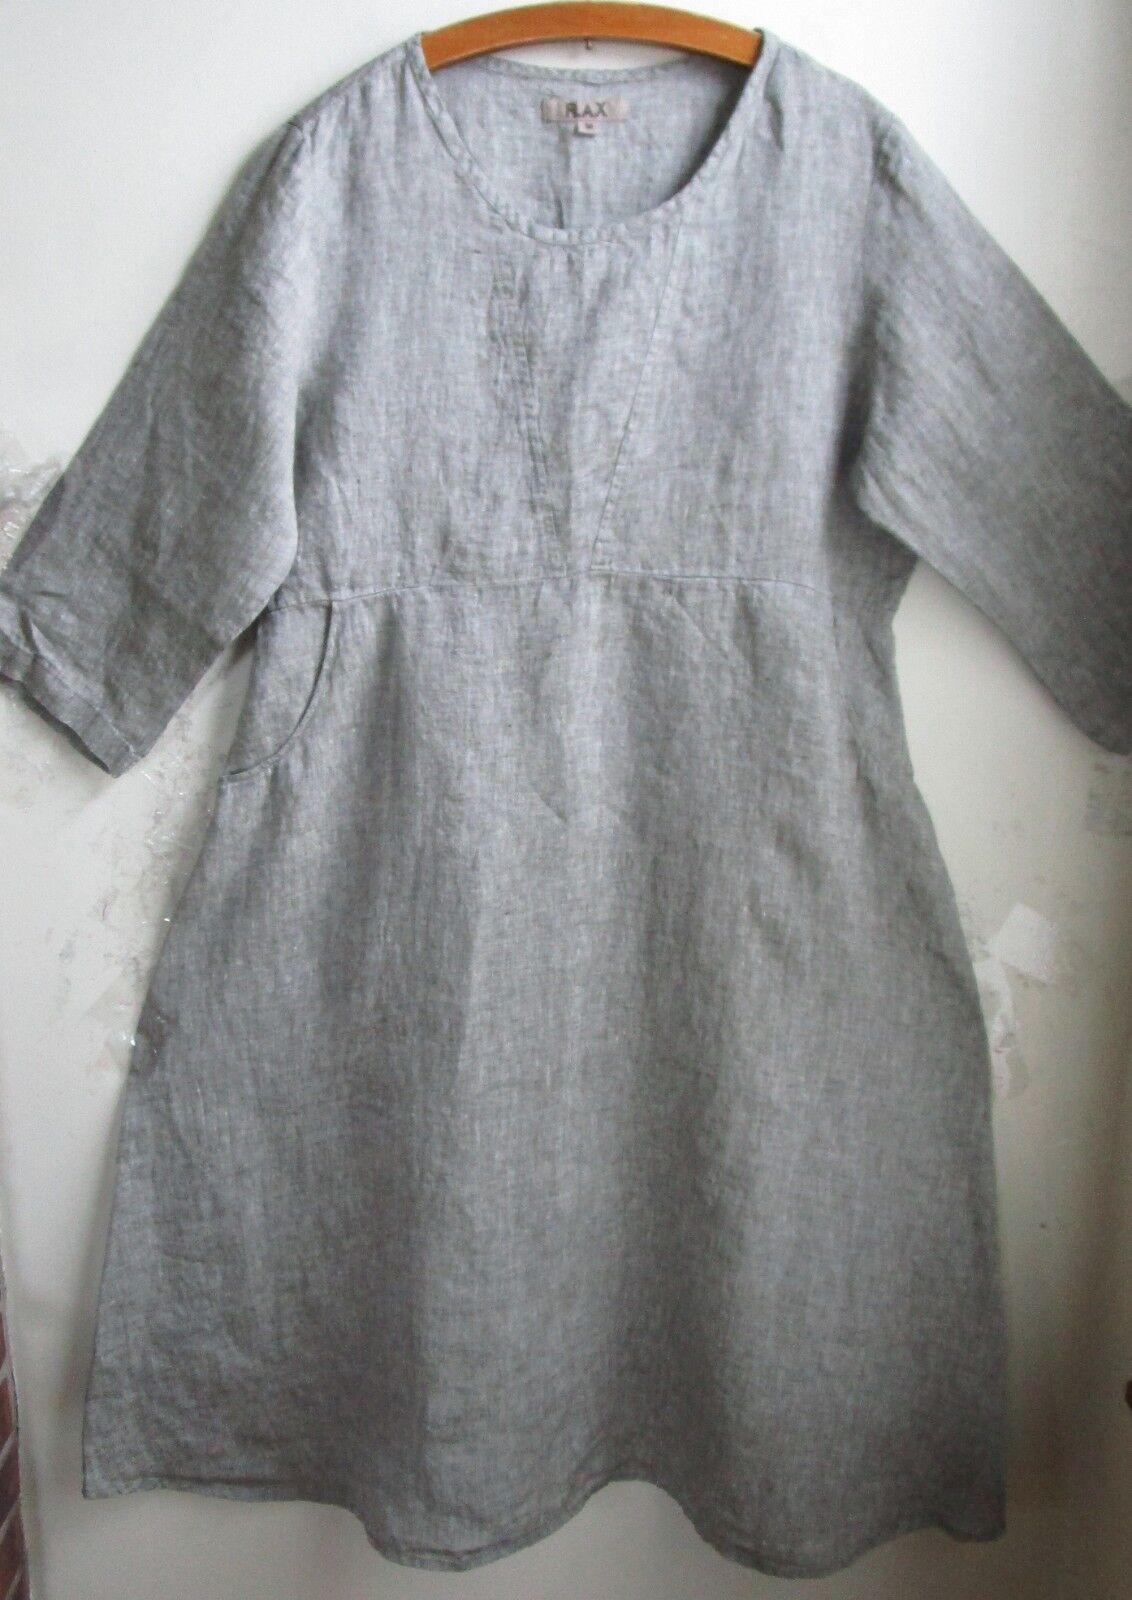 FLAX Designs  Linen   Dashing Dress   1G  & 2G    NWT  HERB